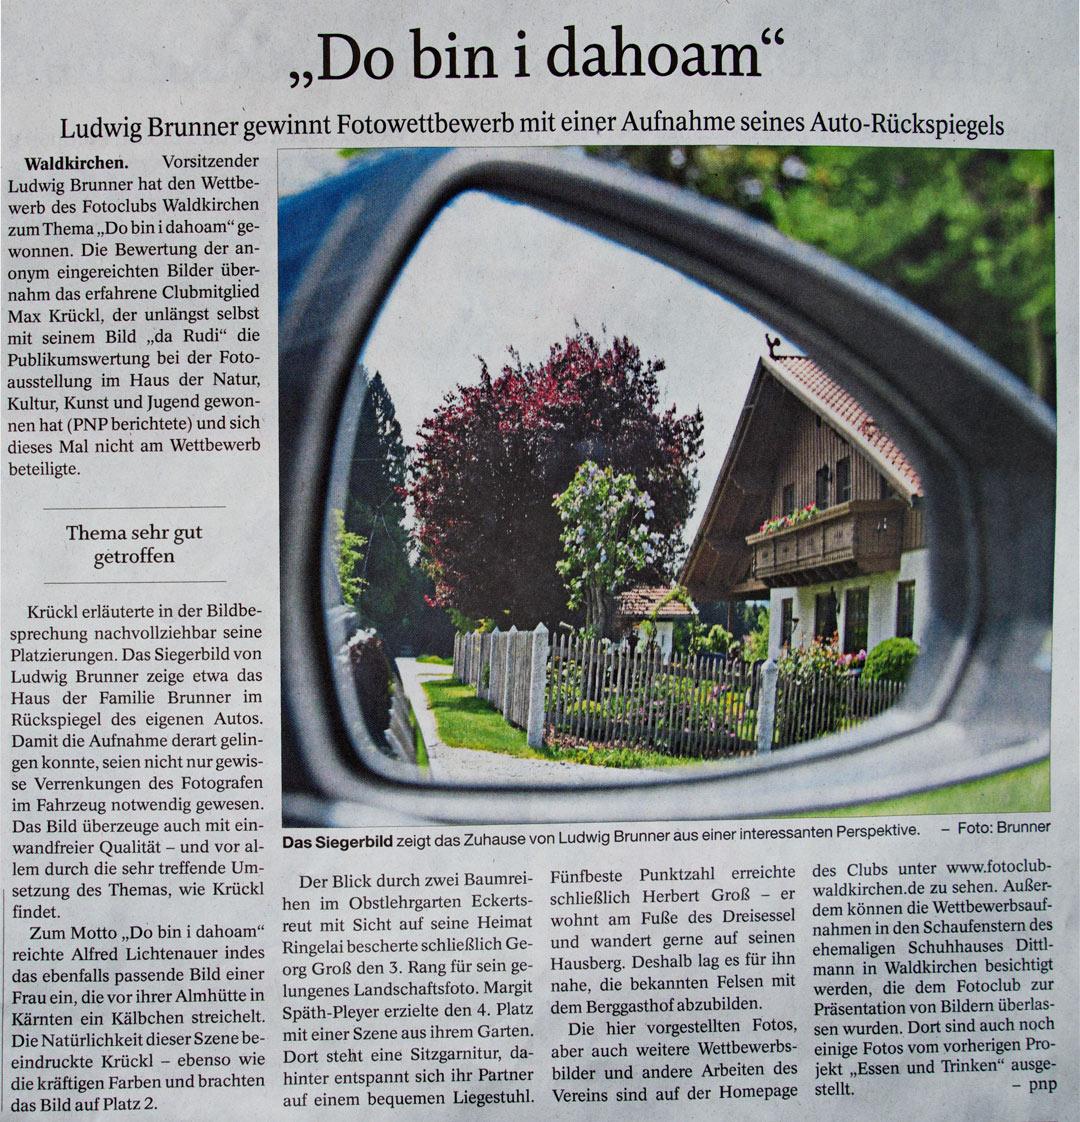 fotowettbewerb-dahoam is dahoam